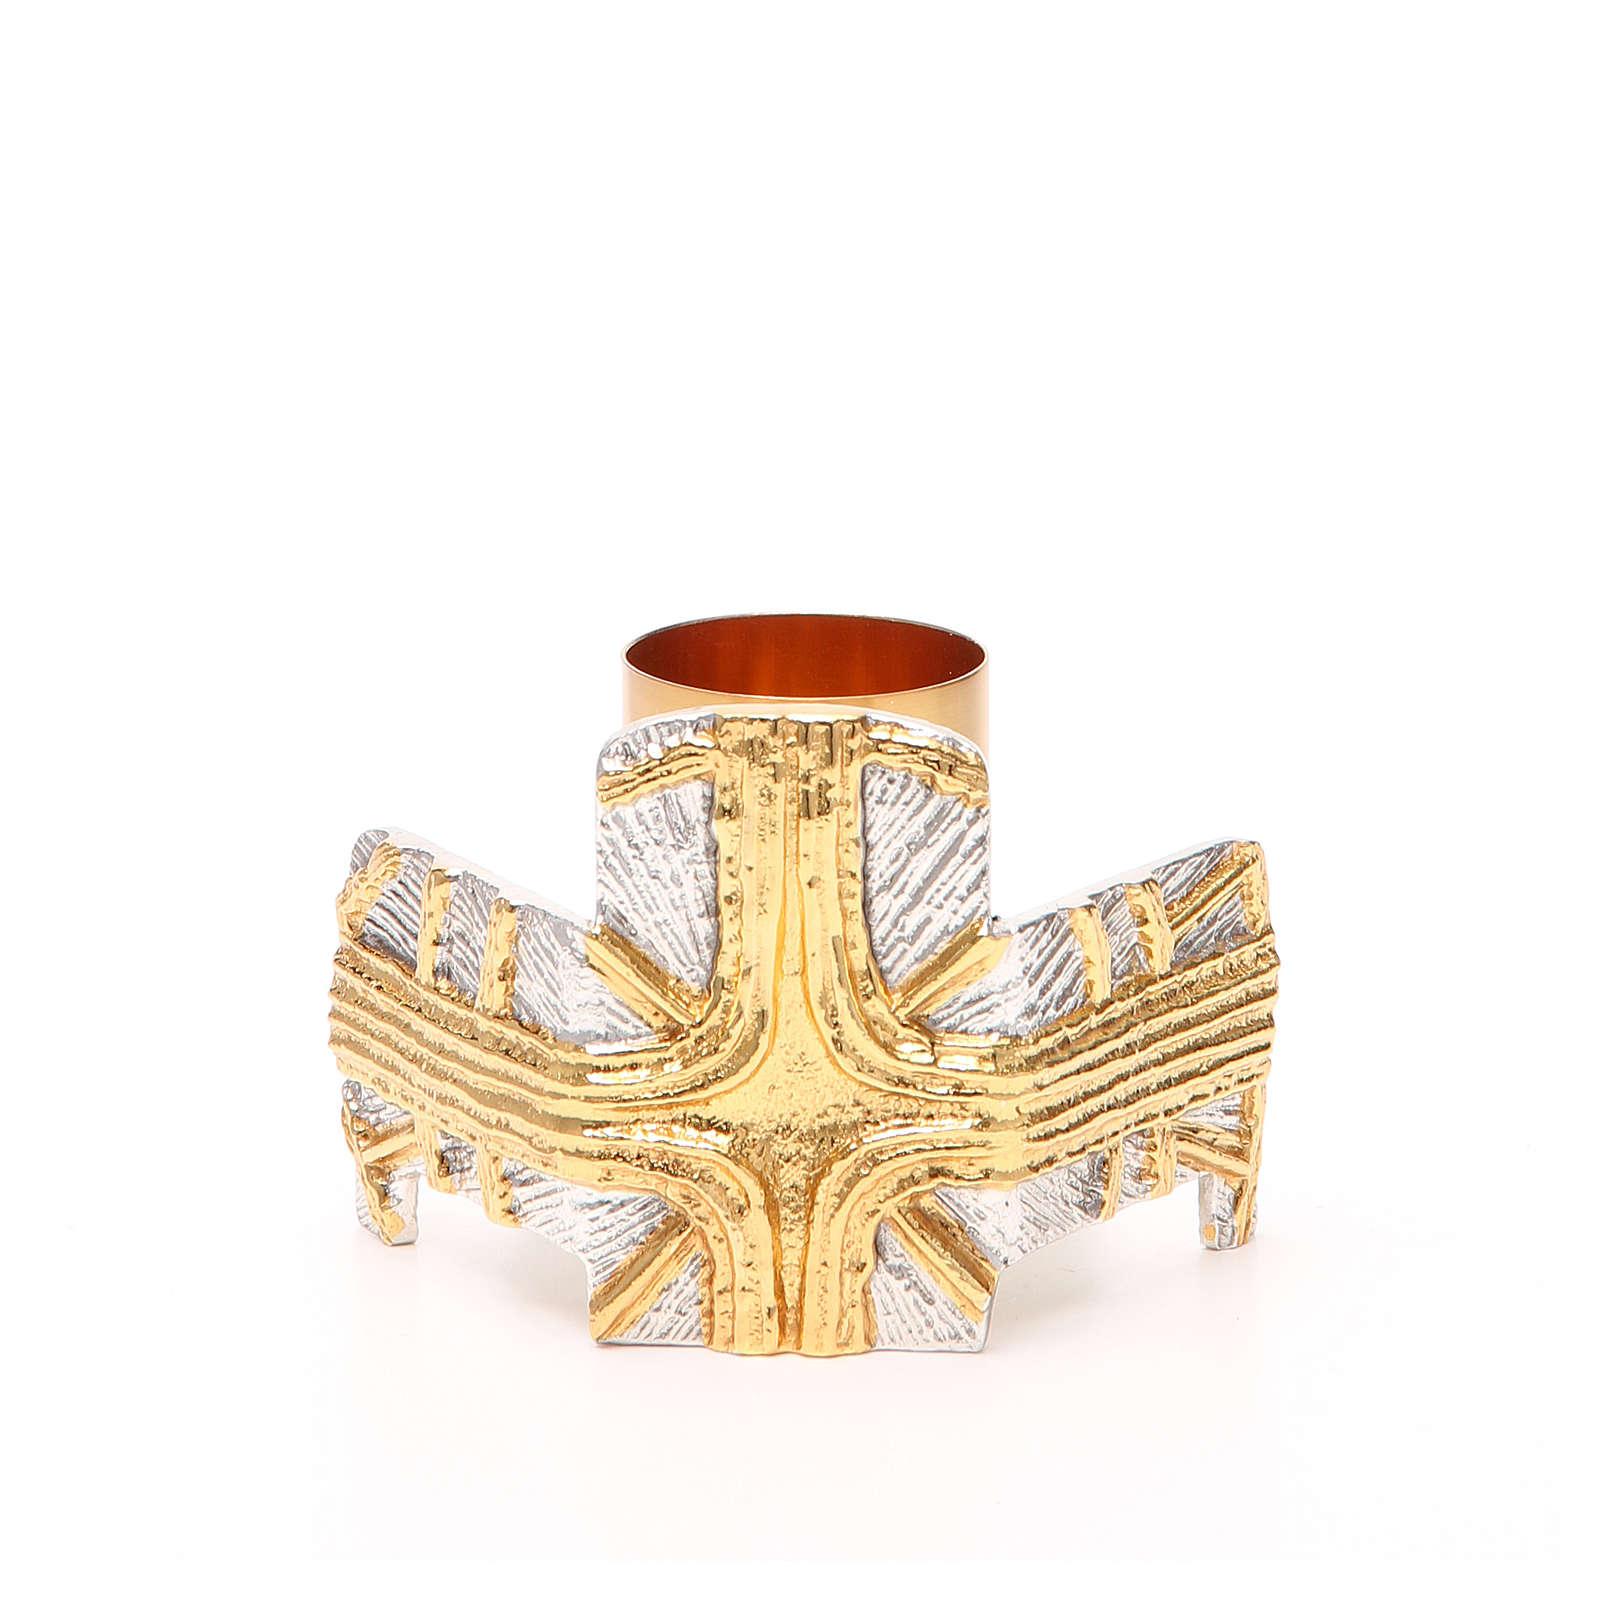 Portacandela bronzo dorato argentato croce e raggi 4